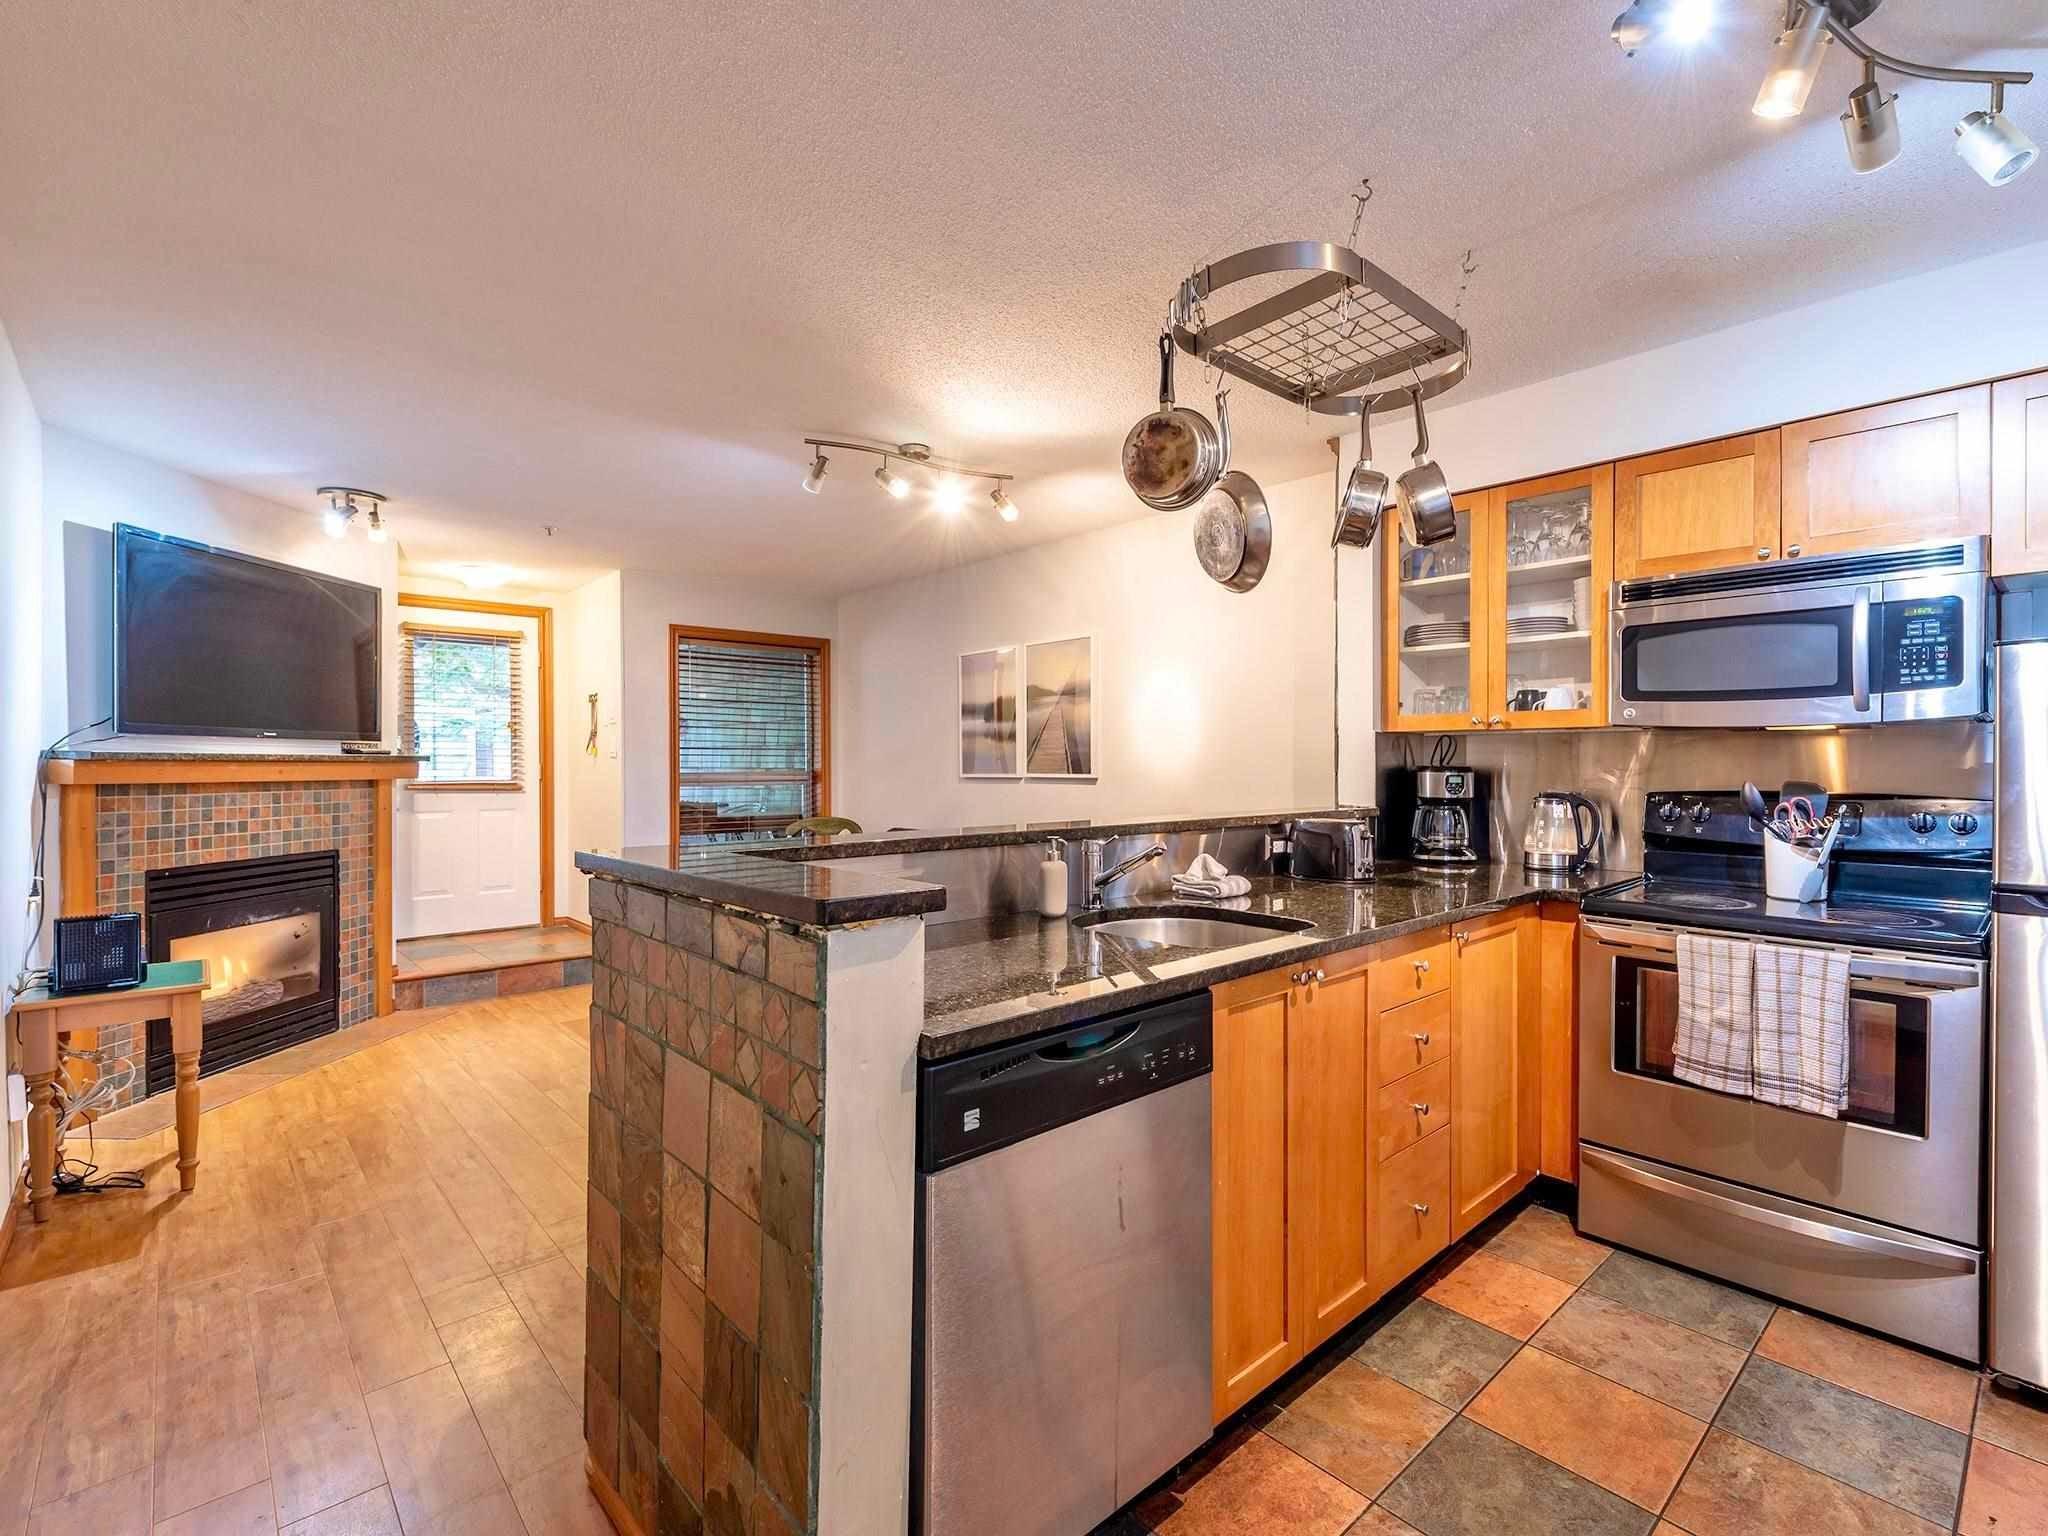 73 4388 NORTHLANDS BOULEVARD - Whistler Village Townhouse for sale, 2 Bedrooms (R2580863) - #7